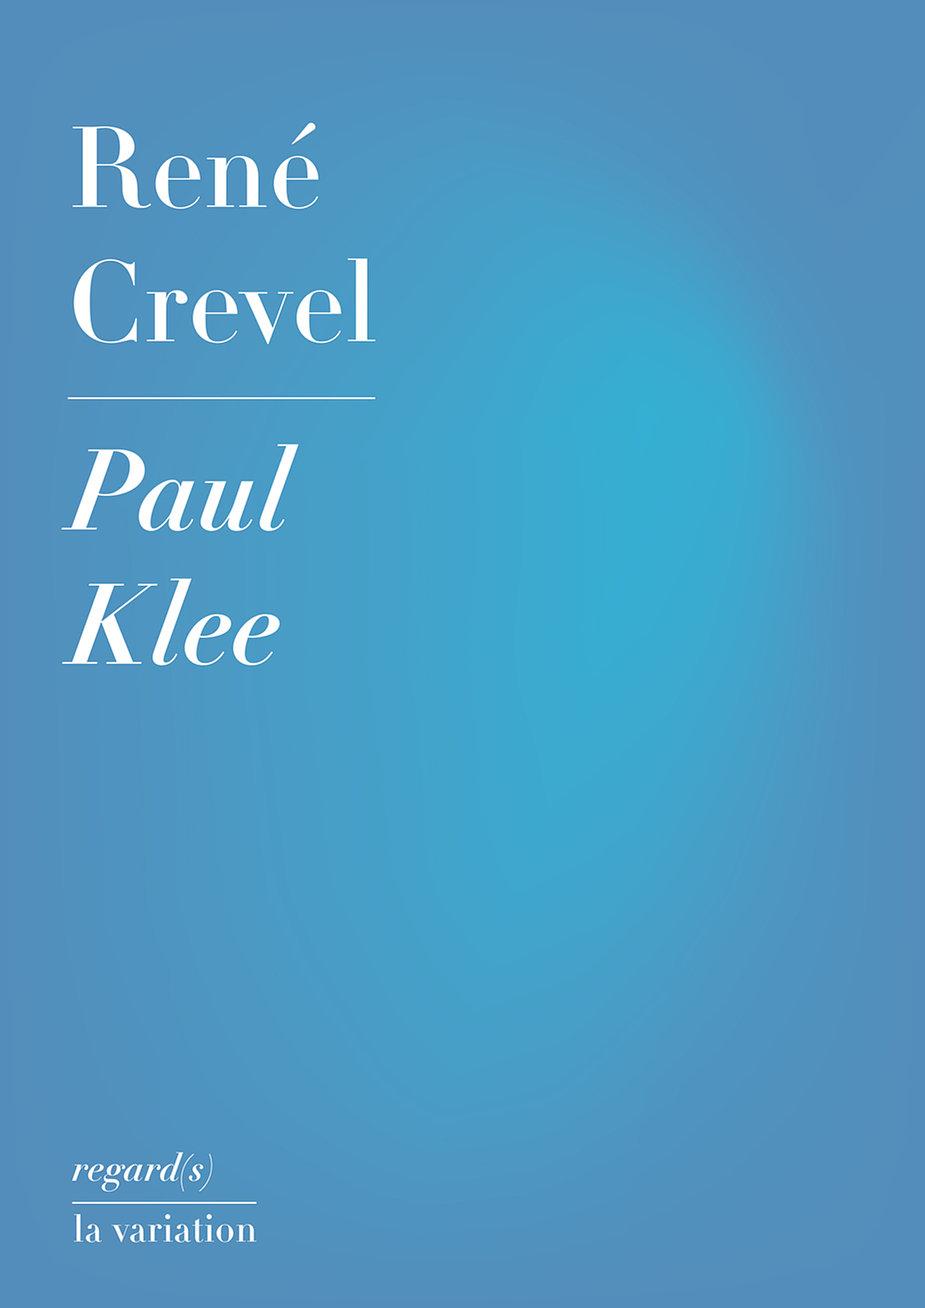 R. Crevel, Paul Klee (1930)